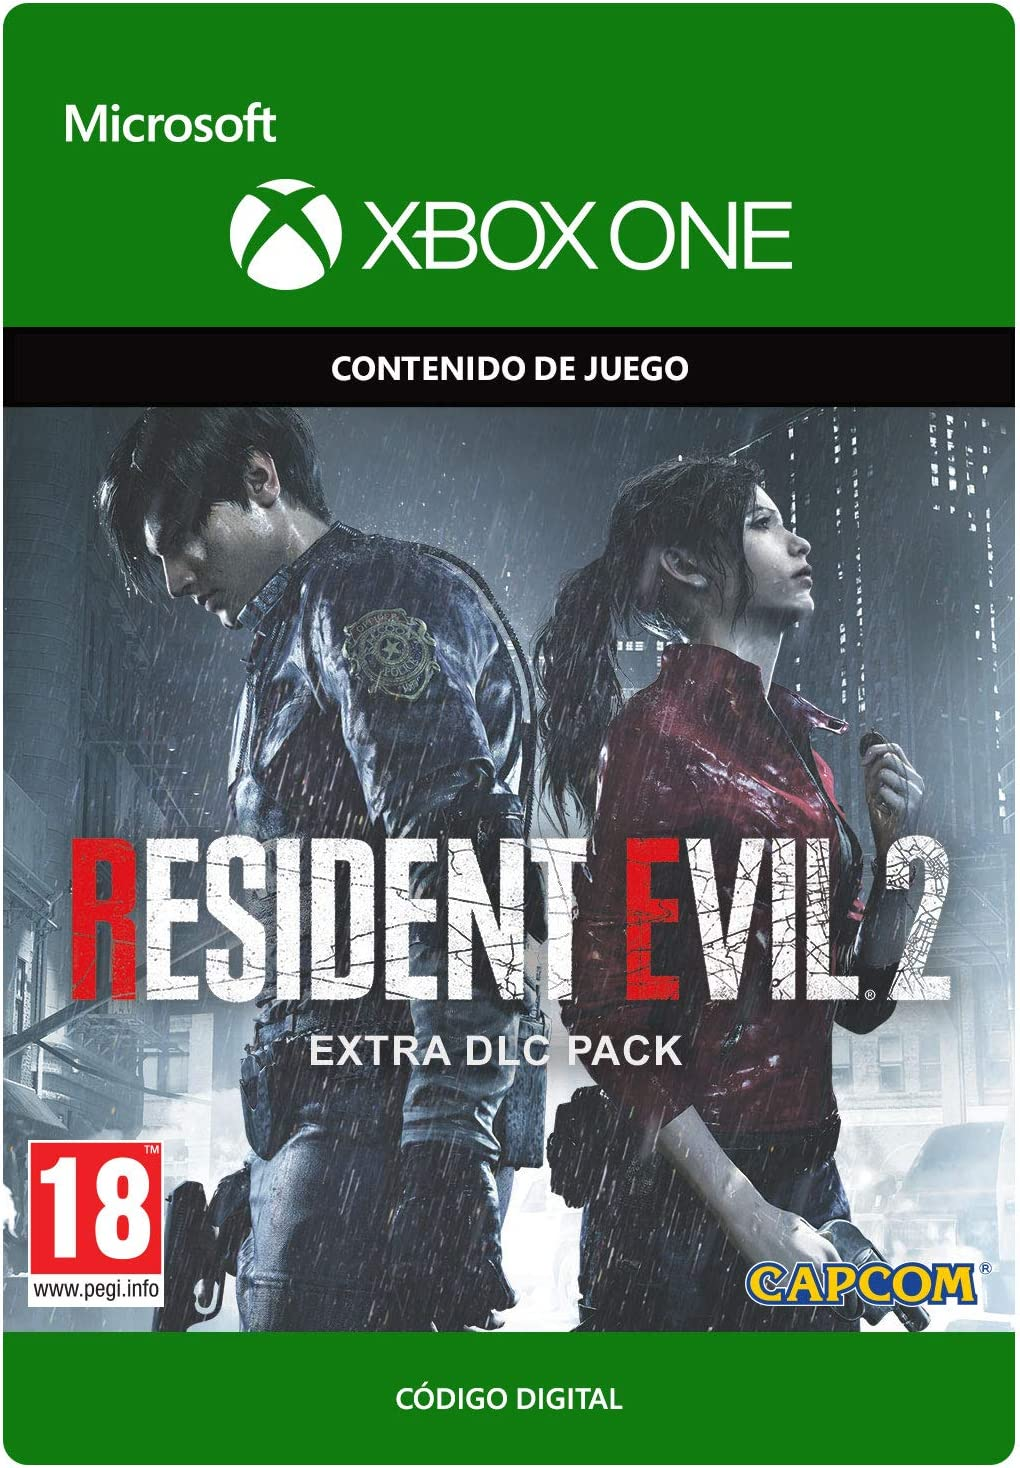 Resident Evil 2 Extra DLC Pack | Xbox One - Código de descarga ...